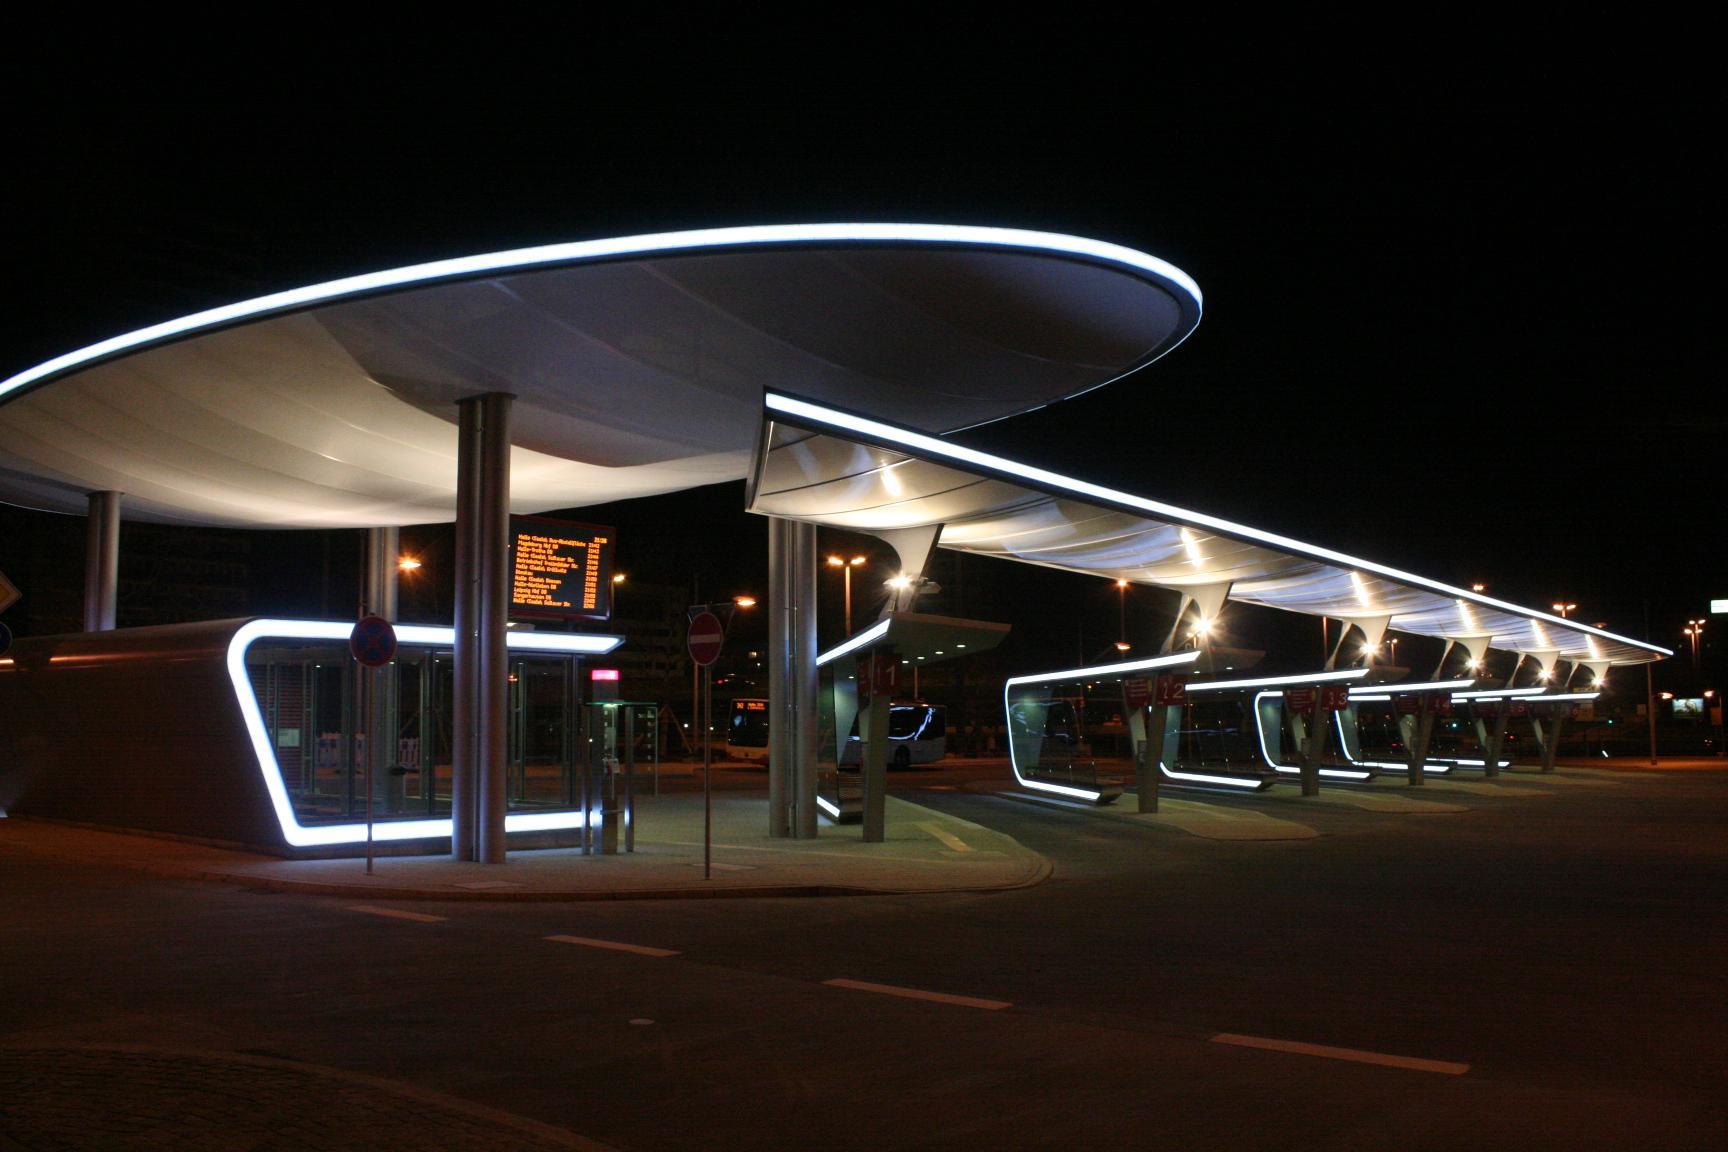 Busbahnhof3